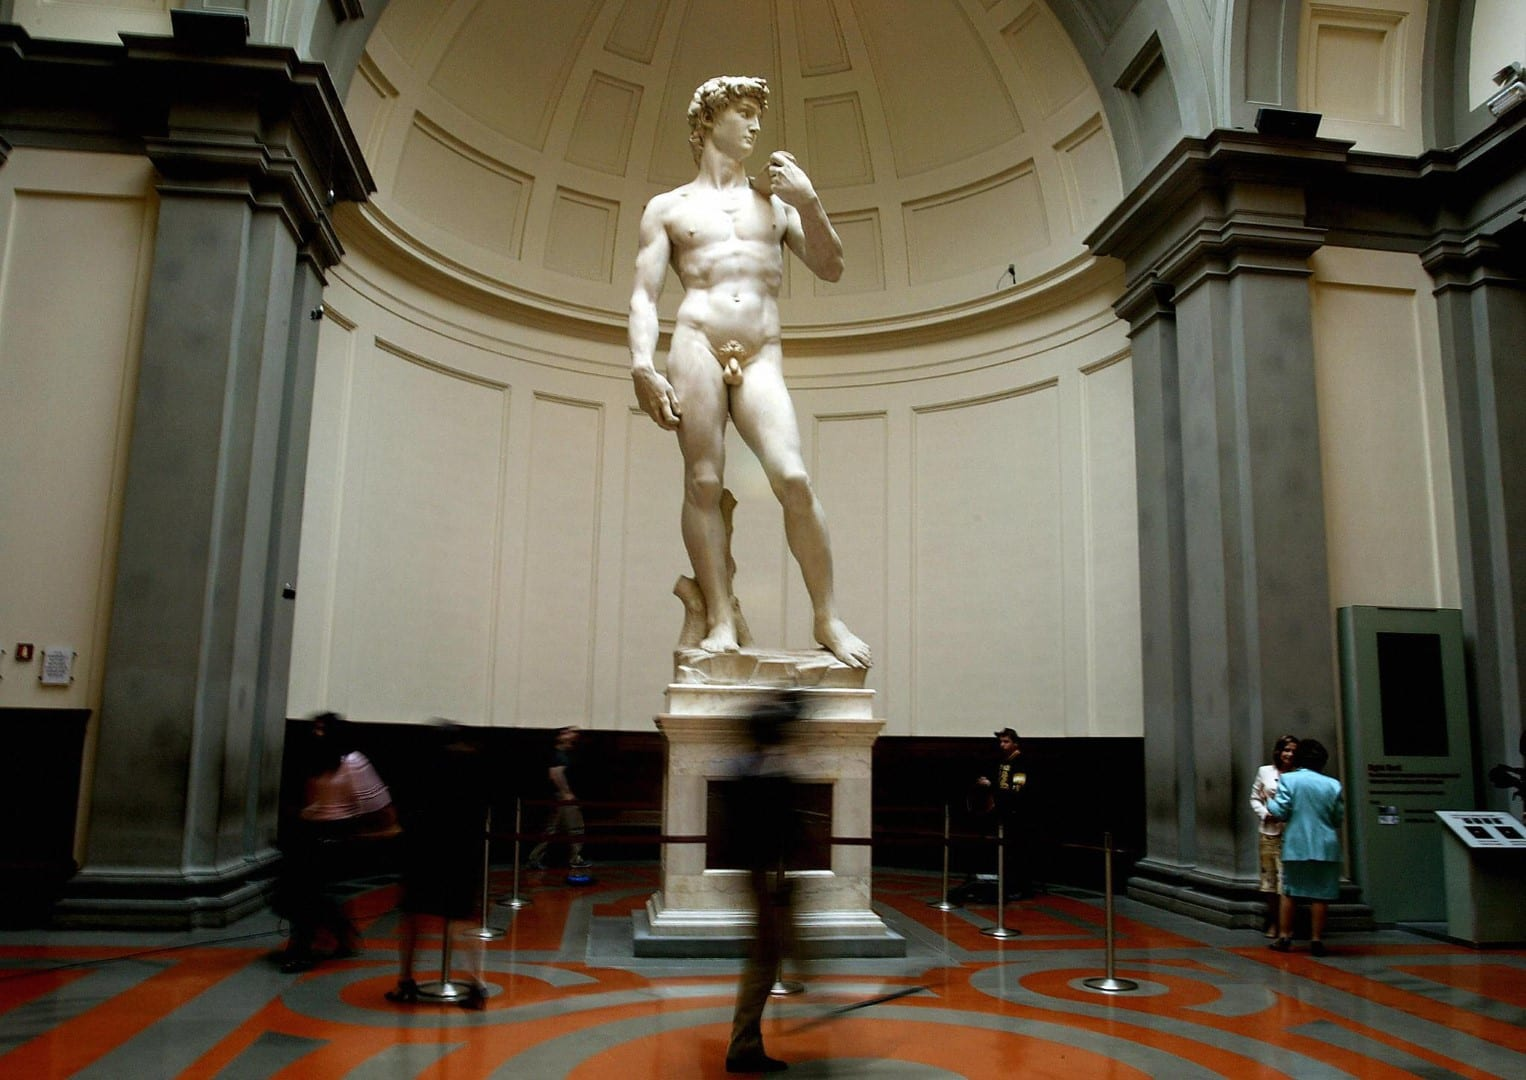 No Green pass, No David. A Firenze Accademia chiusa per sciopero